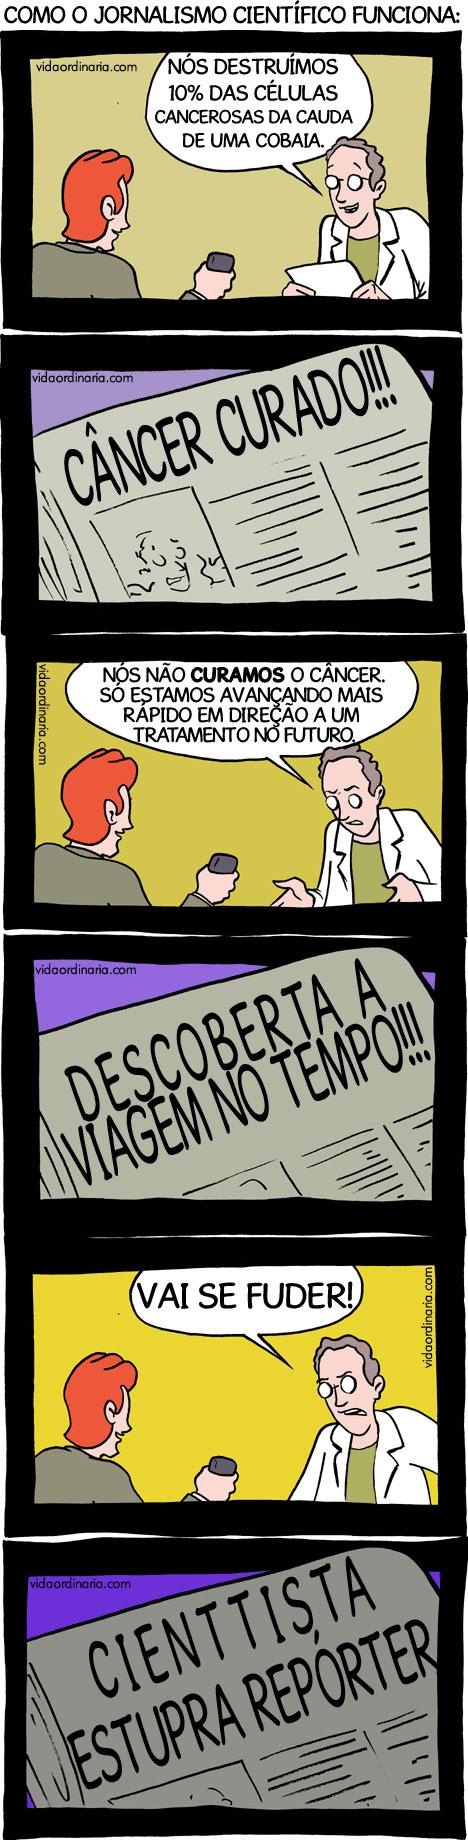 http://vidaordinaria.files.wordpress.com/2009/08/jornalismo_cientifico1.jpg